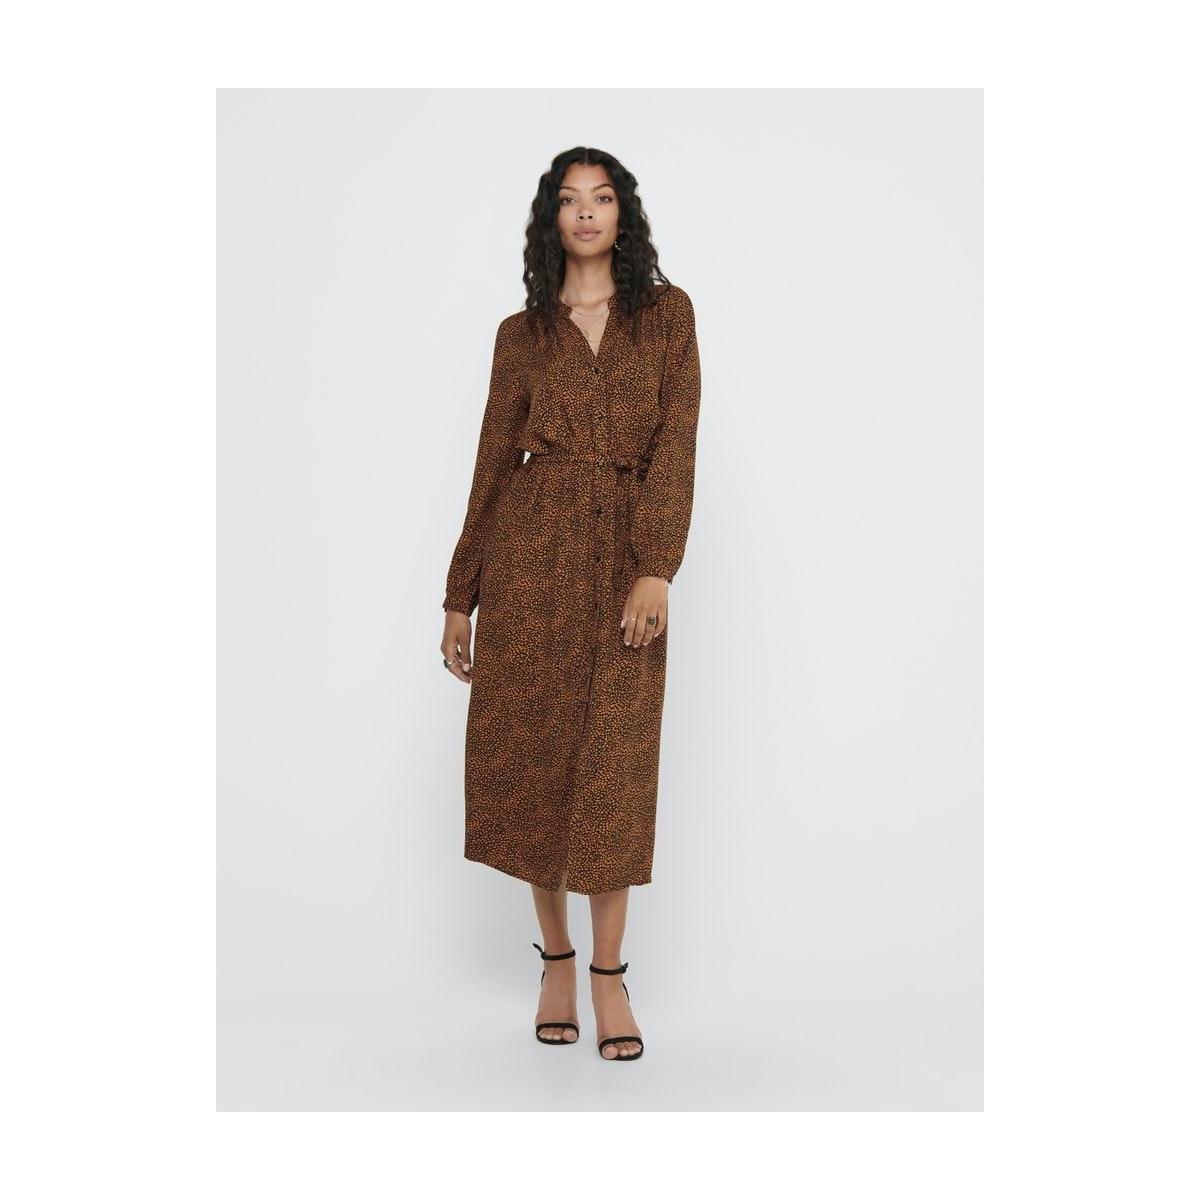 jdypearl l/s midcalf dress wvn 15209002 jacqueline de yong jurk black/ leather brown